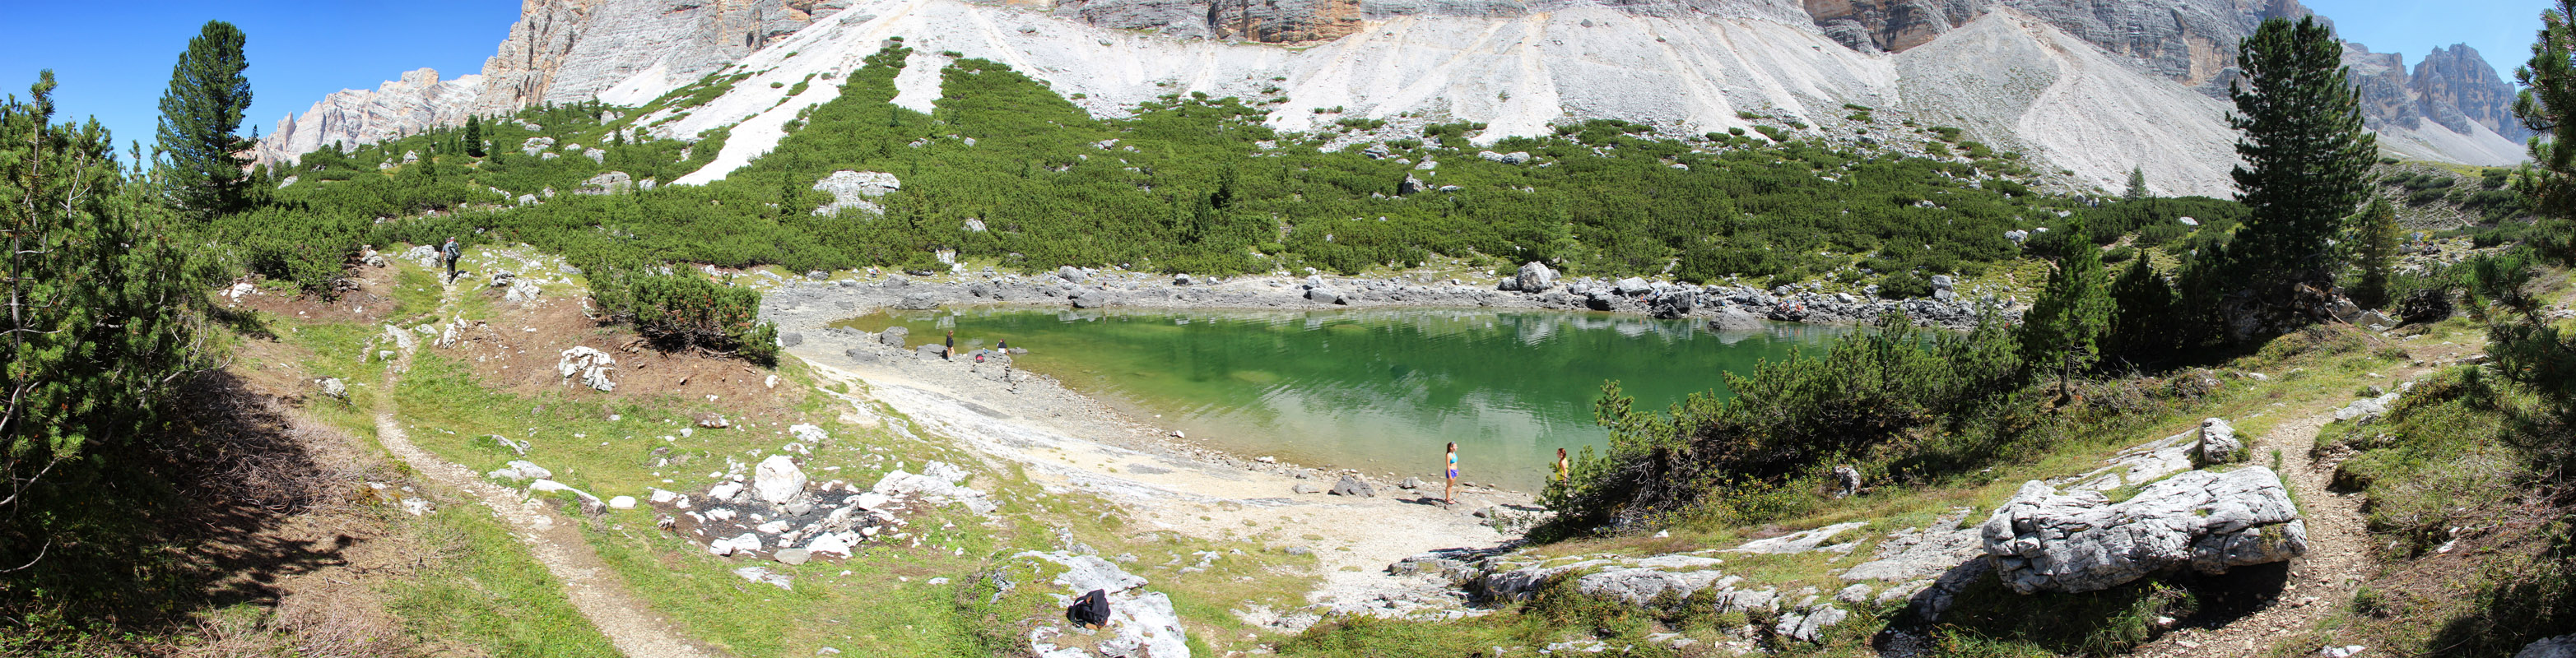 Panoráma pri plese Le de Lagacio, Dolomity